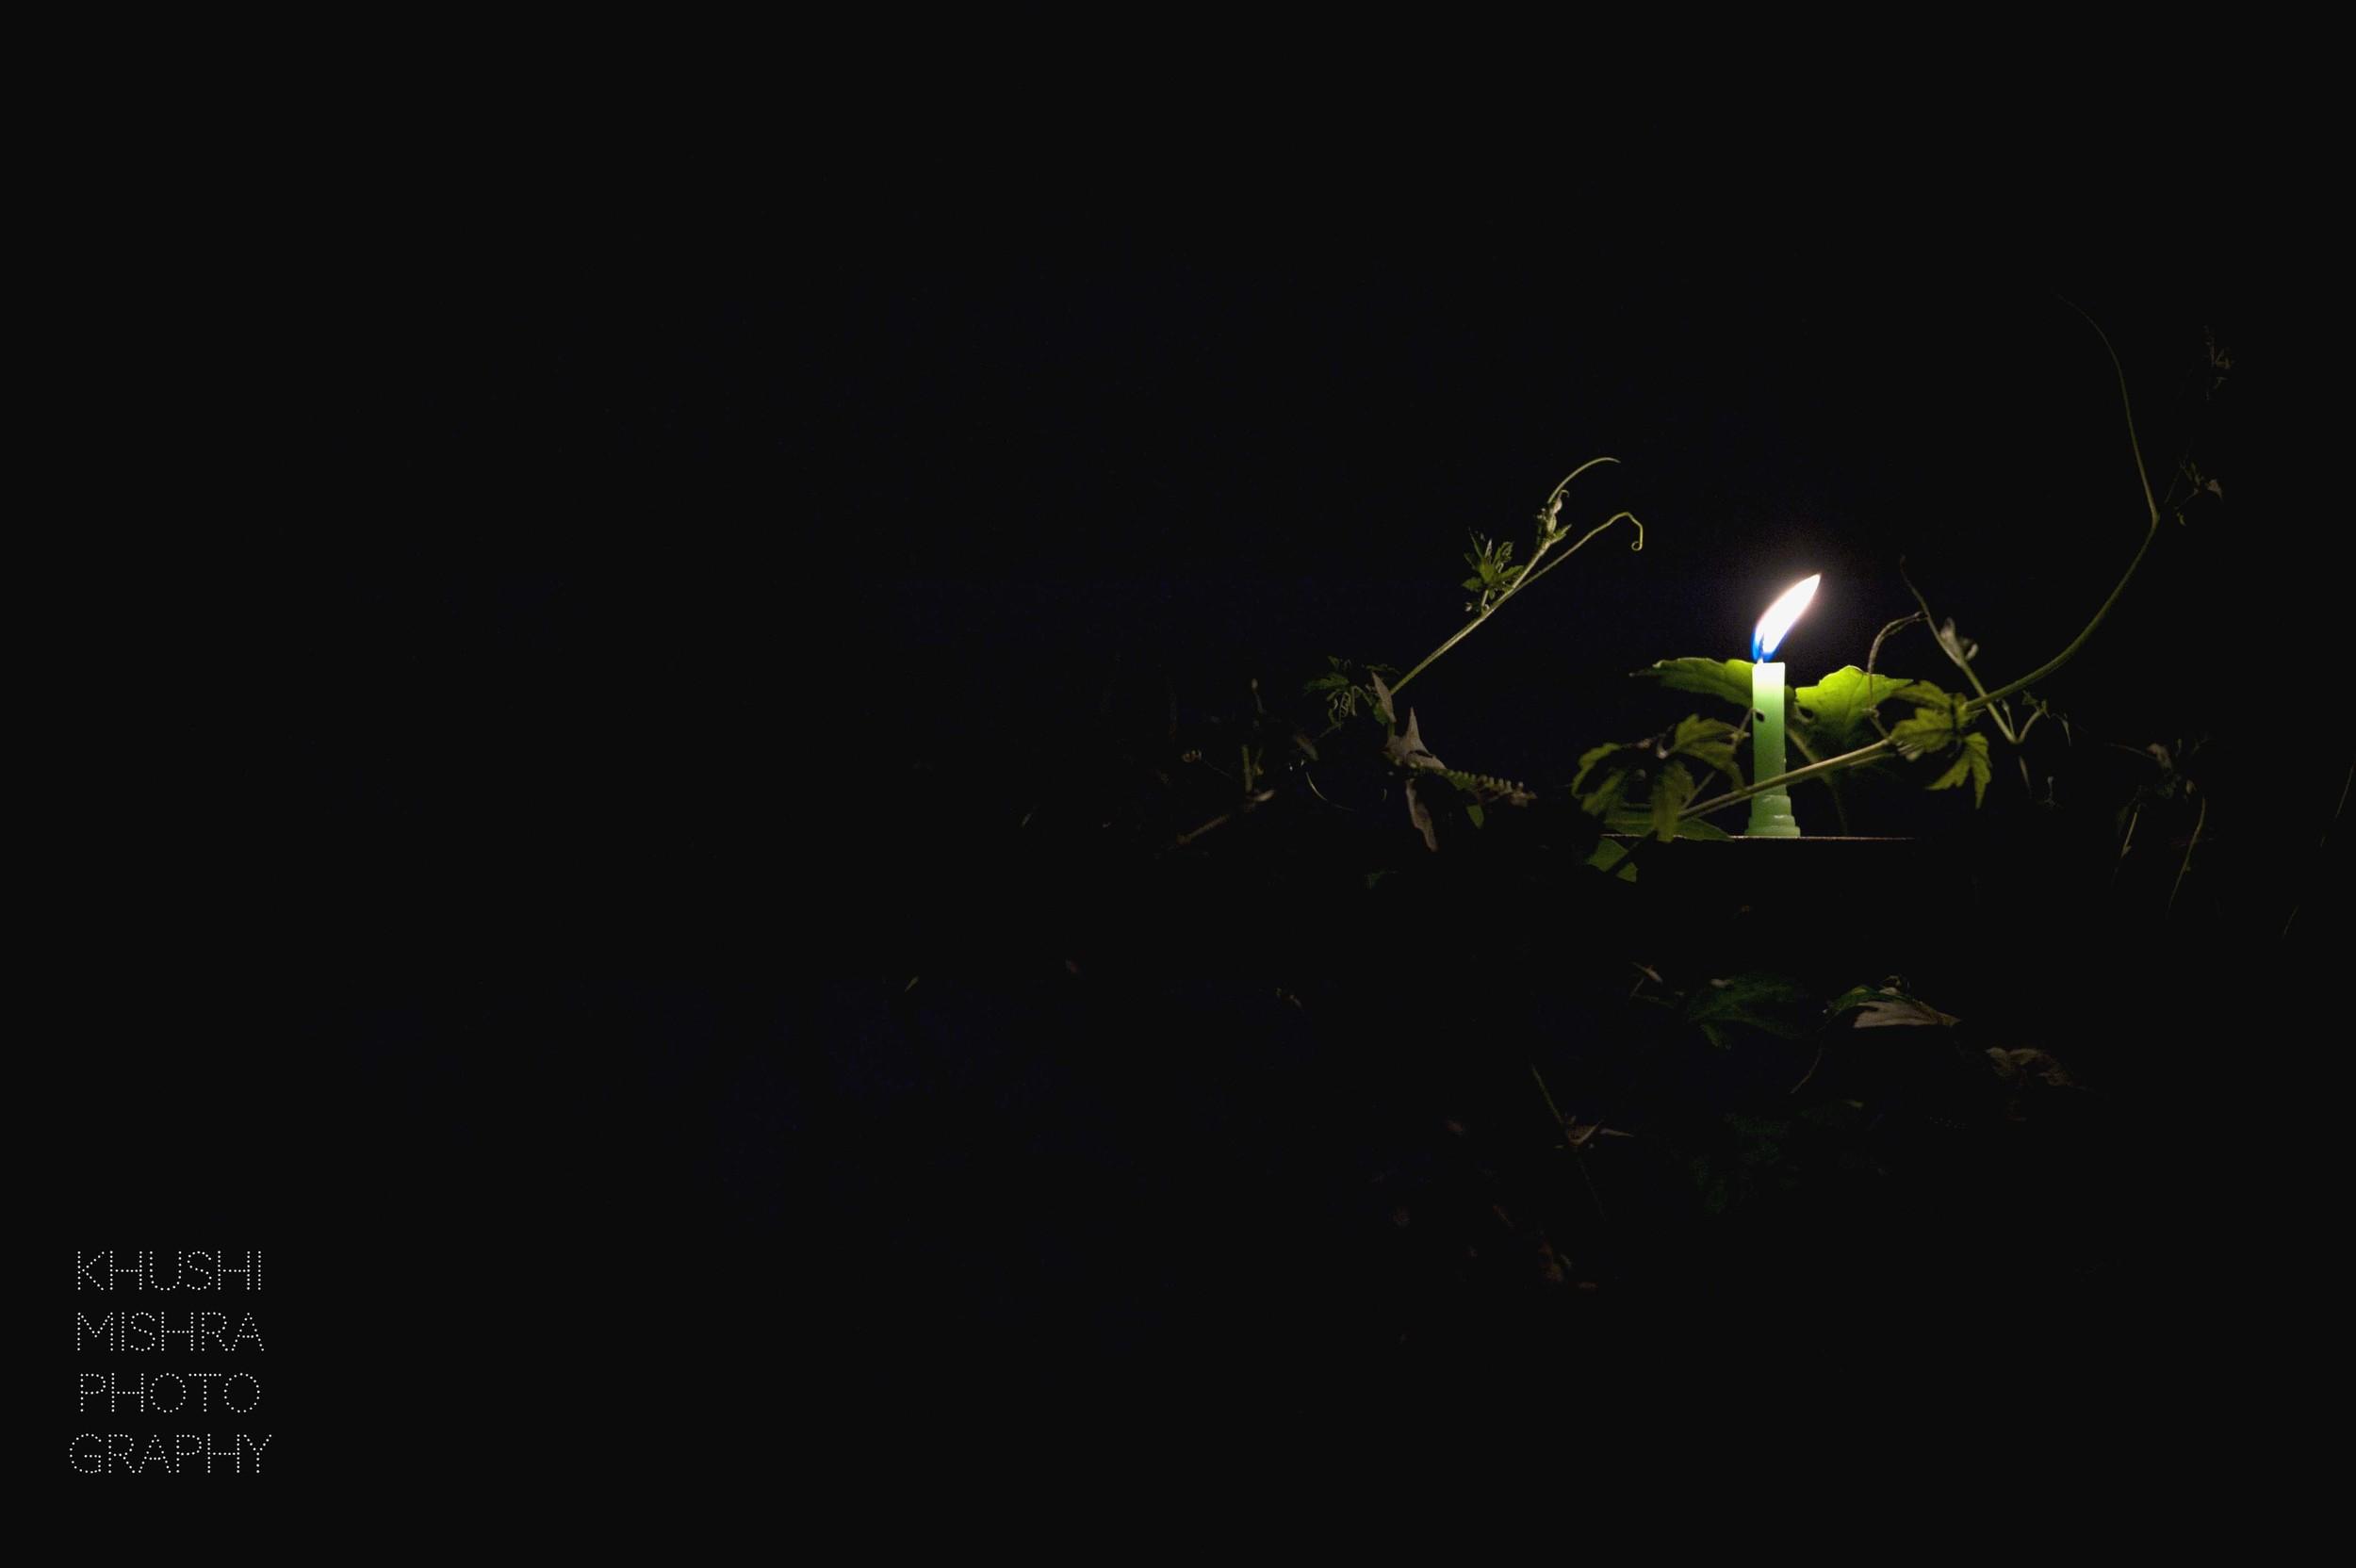 neighbour diwali_diwali_dsc_5408.jpg